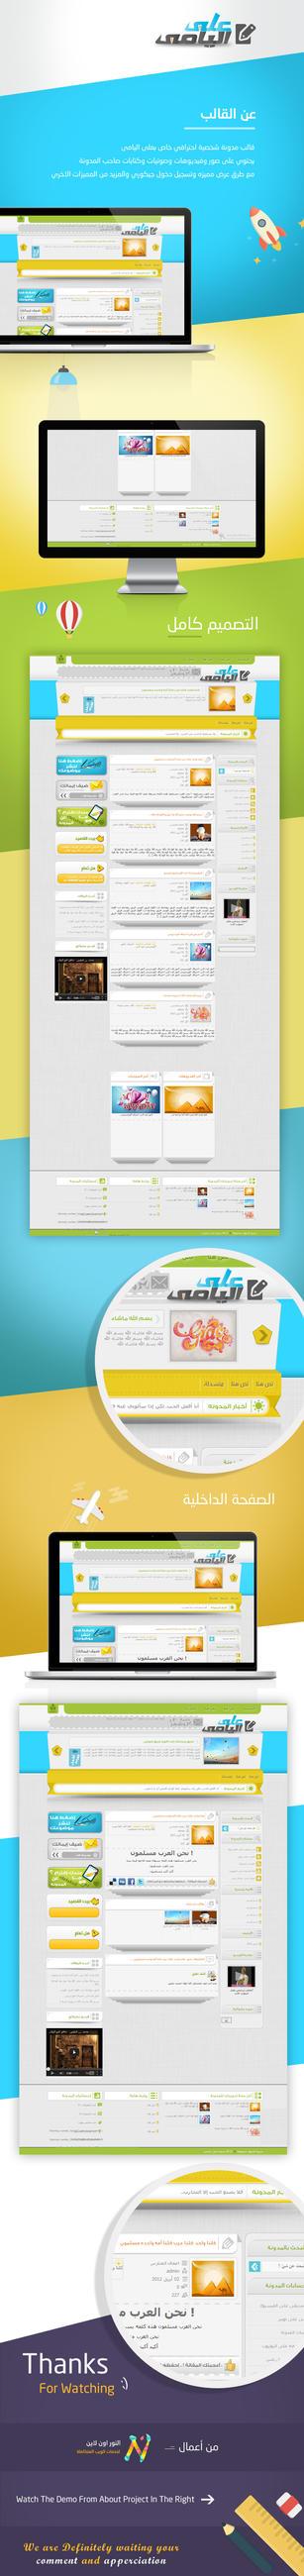 Ali Yami Wordpress Personal Blog by ElNoorOnline